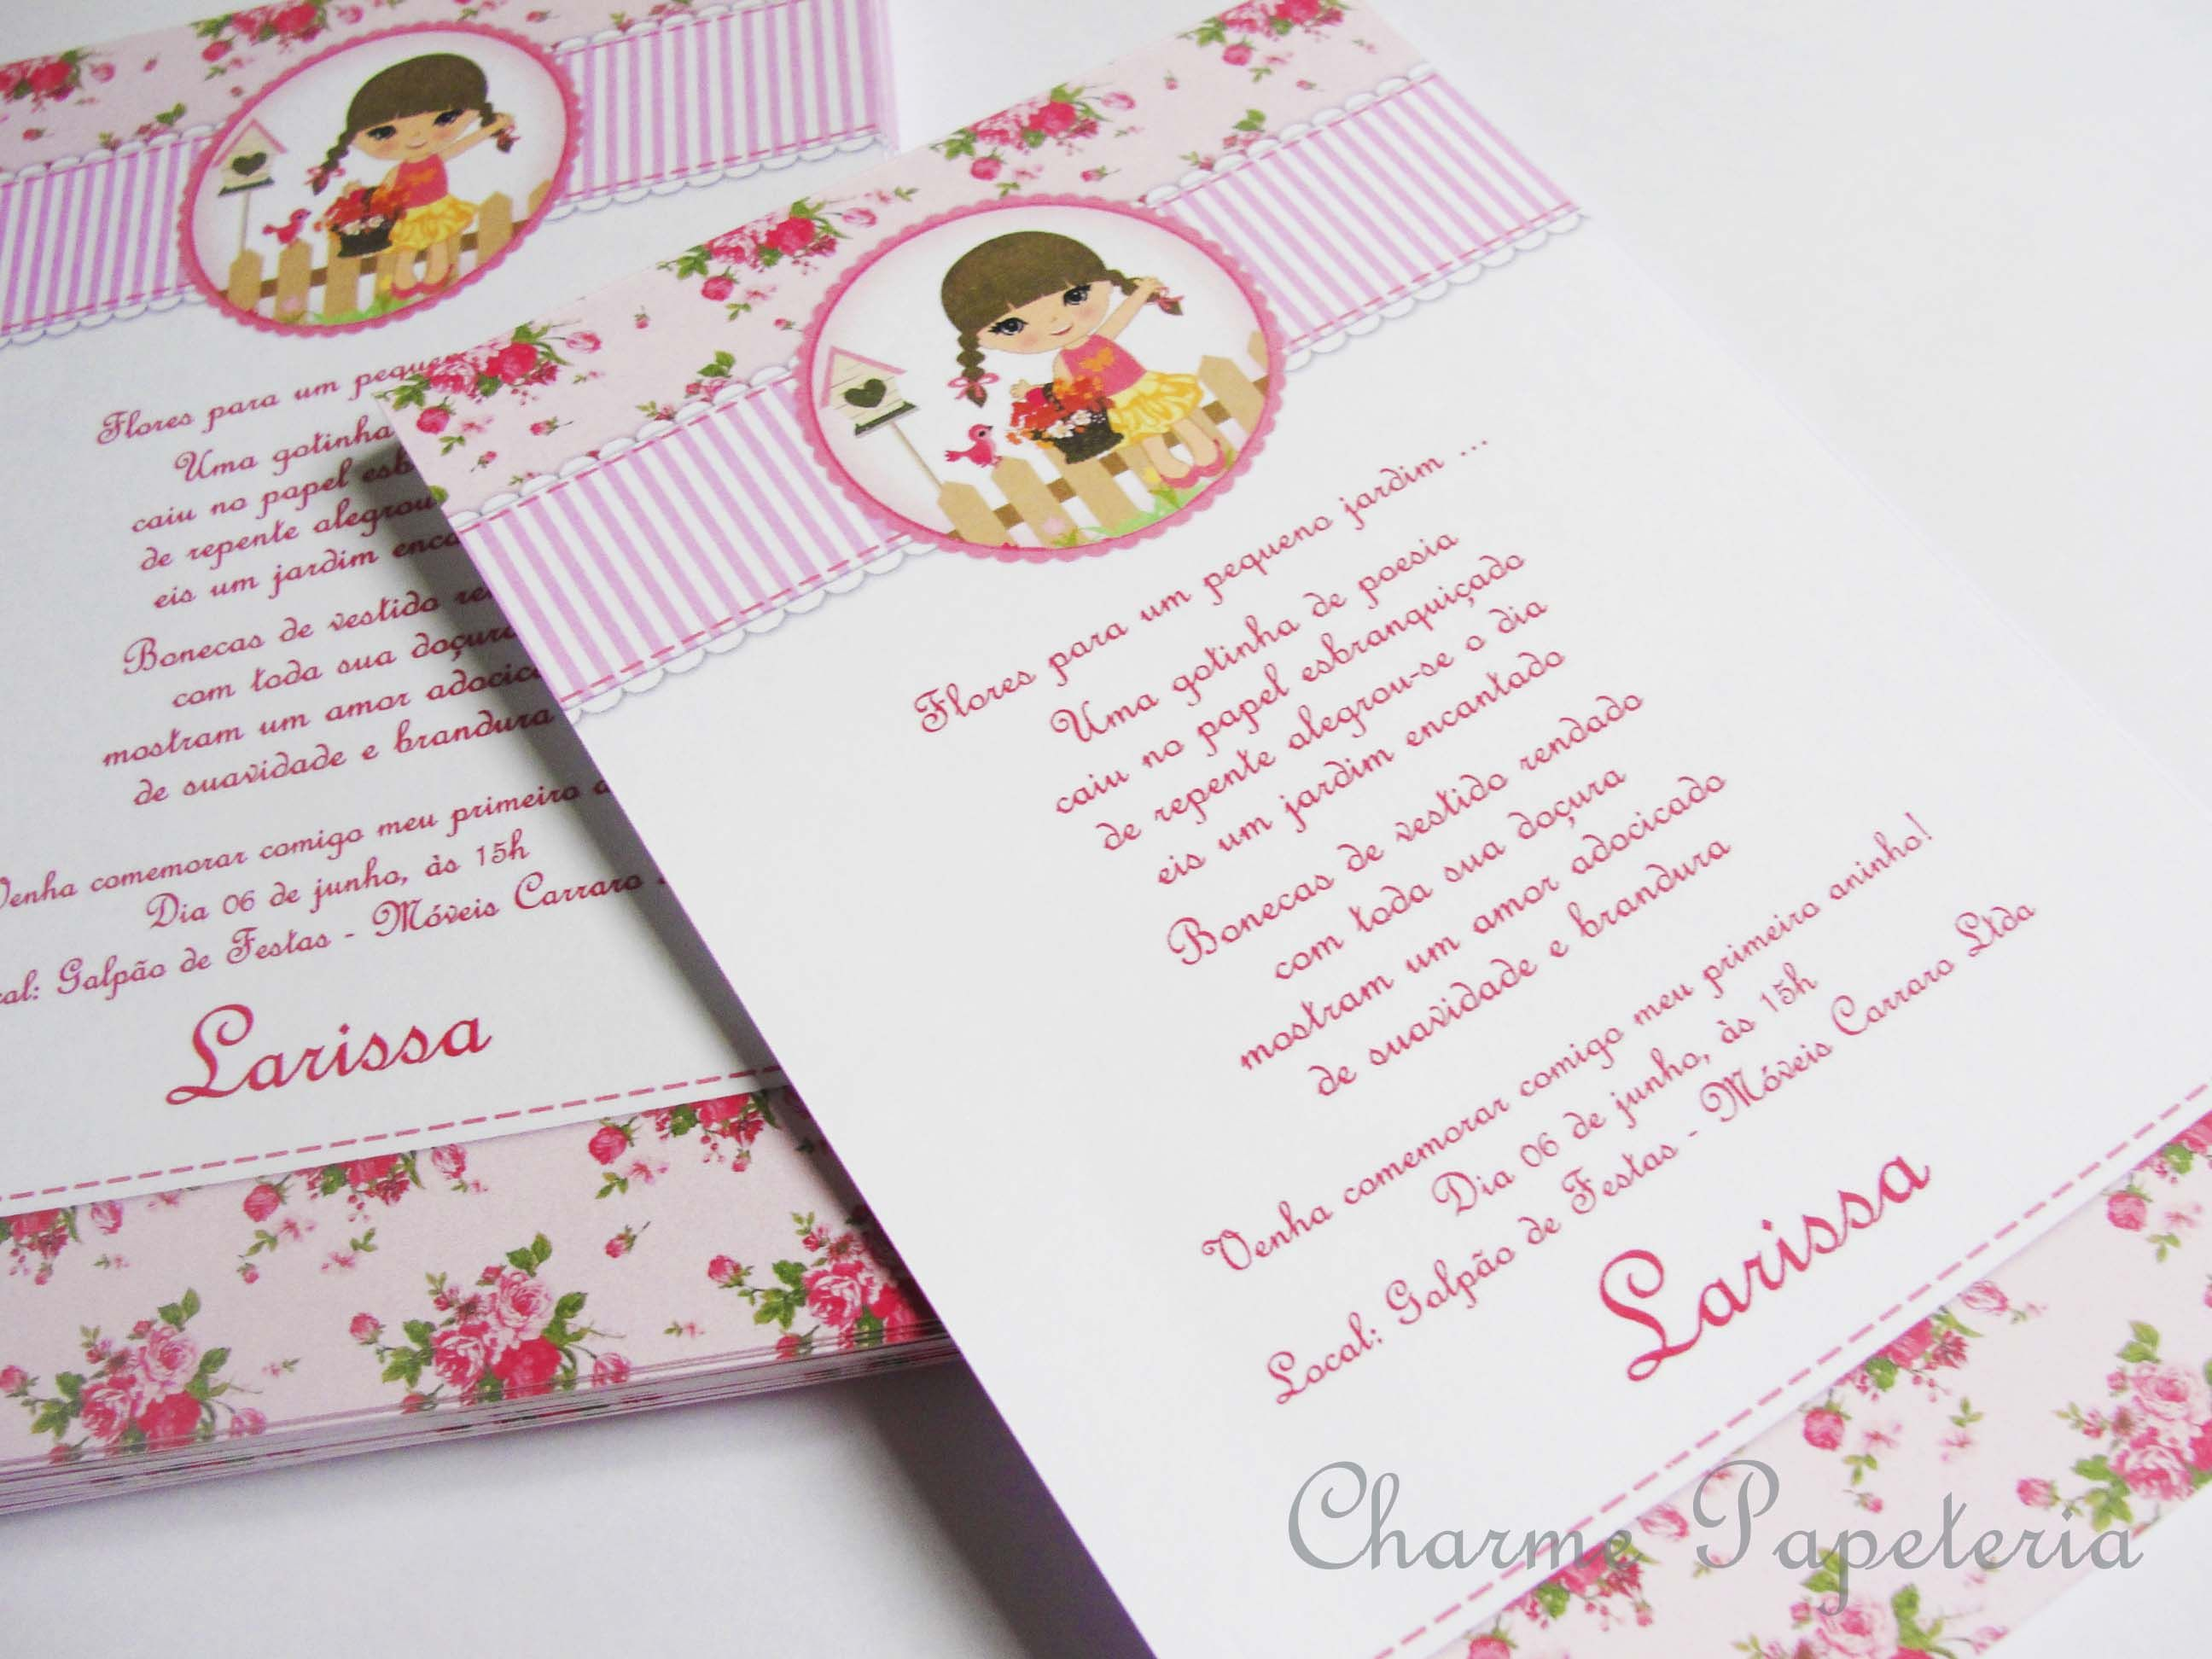 Convite Boneca - Charme Papeteria #convite #boneca #jardim #personalizado #floral #rosa #flores #jardimdasbonecas